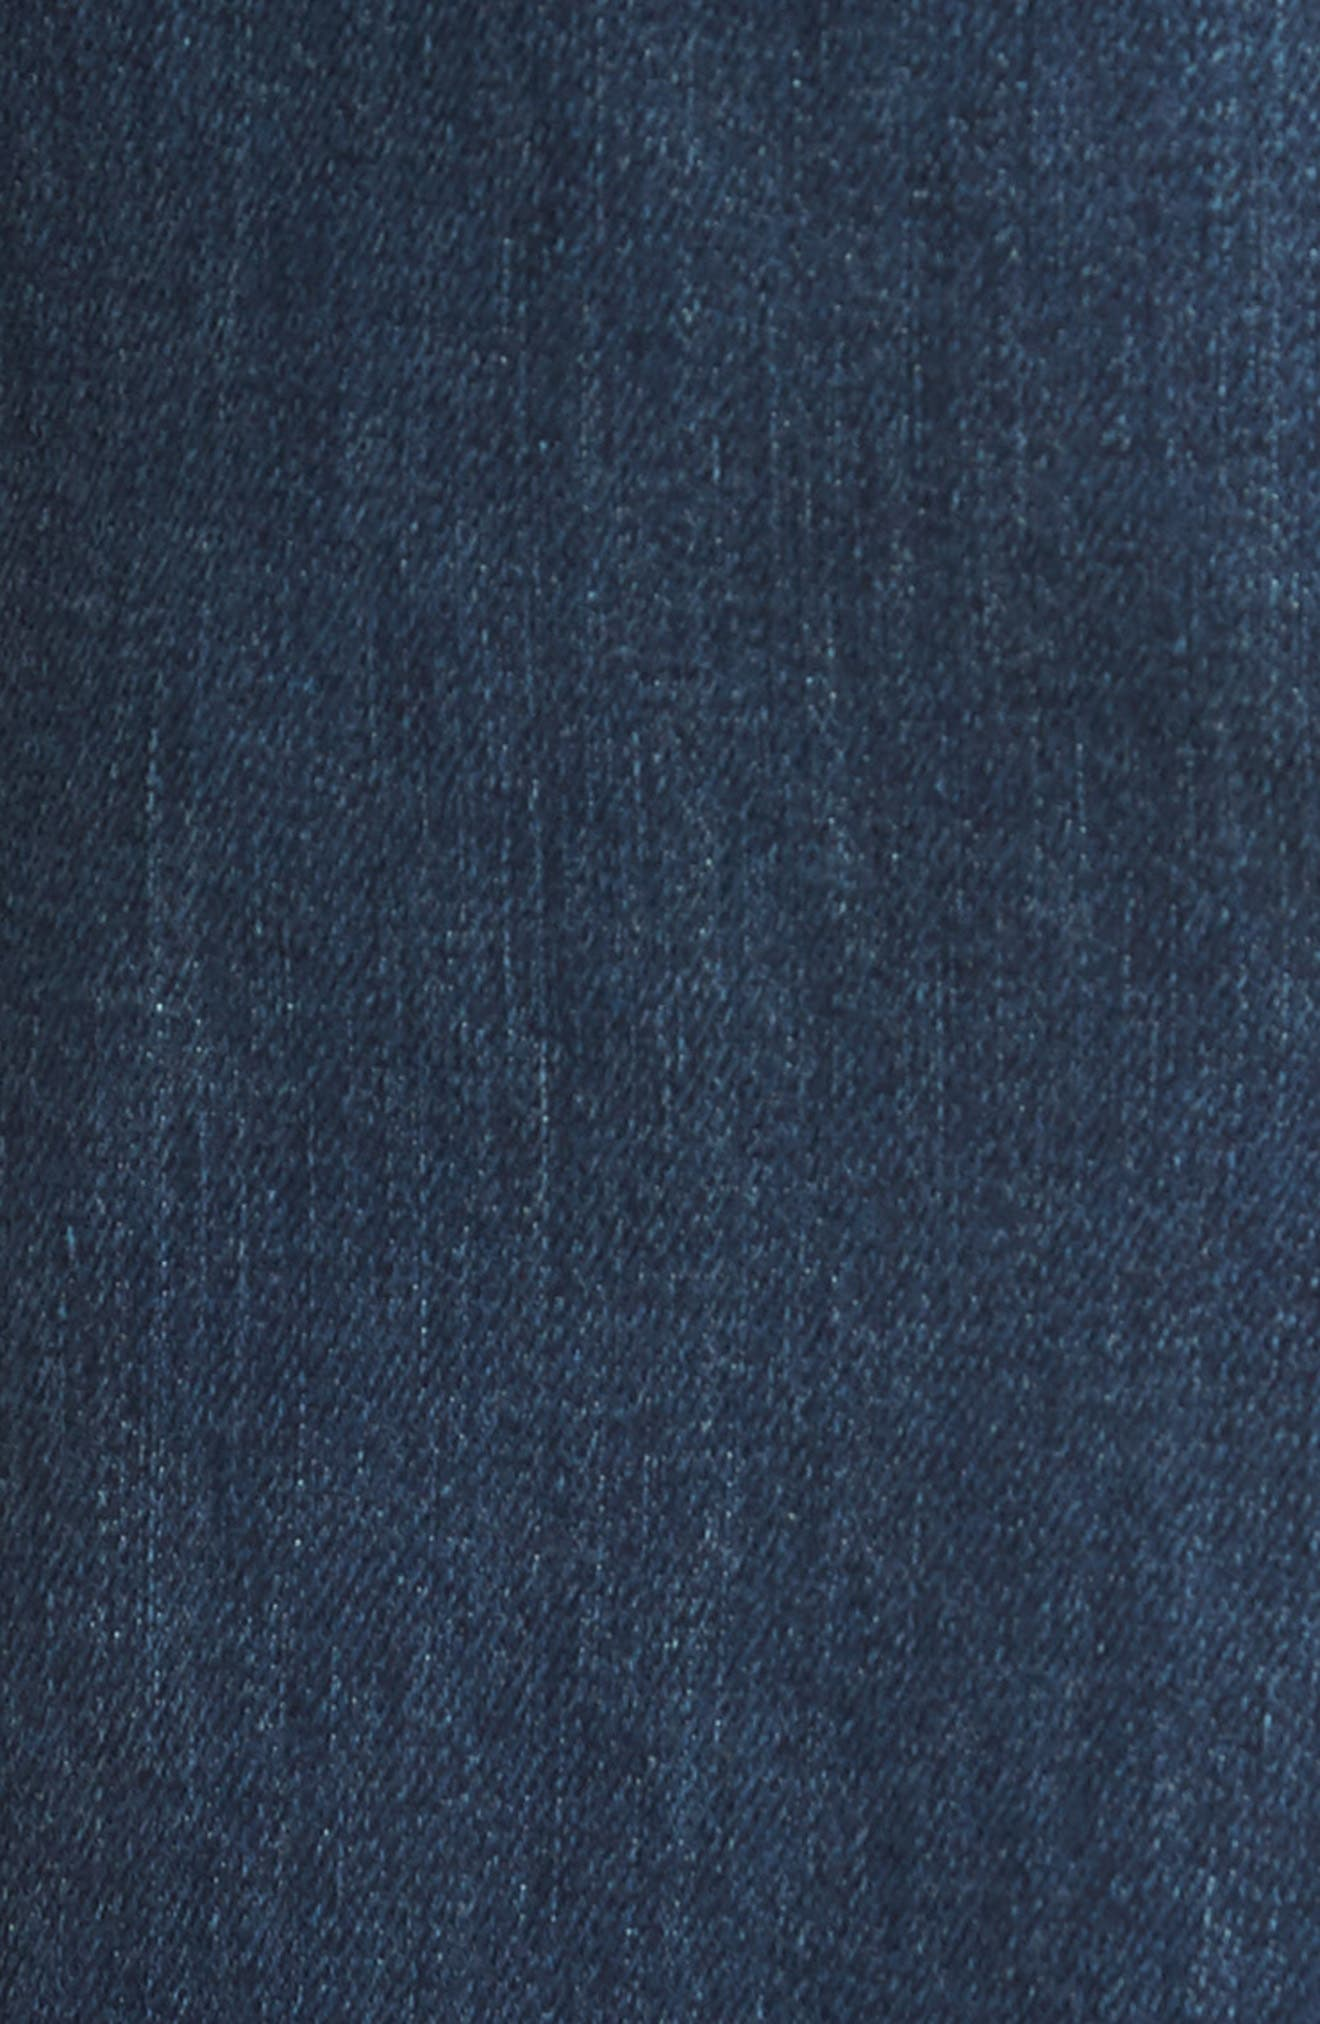 Brixton Slim Straight Fit Jeans,                             Alternate thumbnail 5, color,                             400